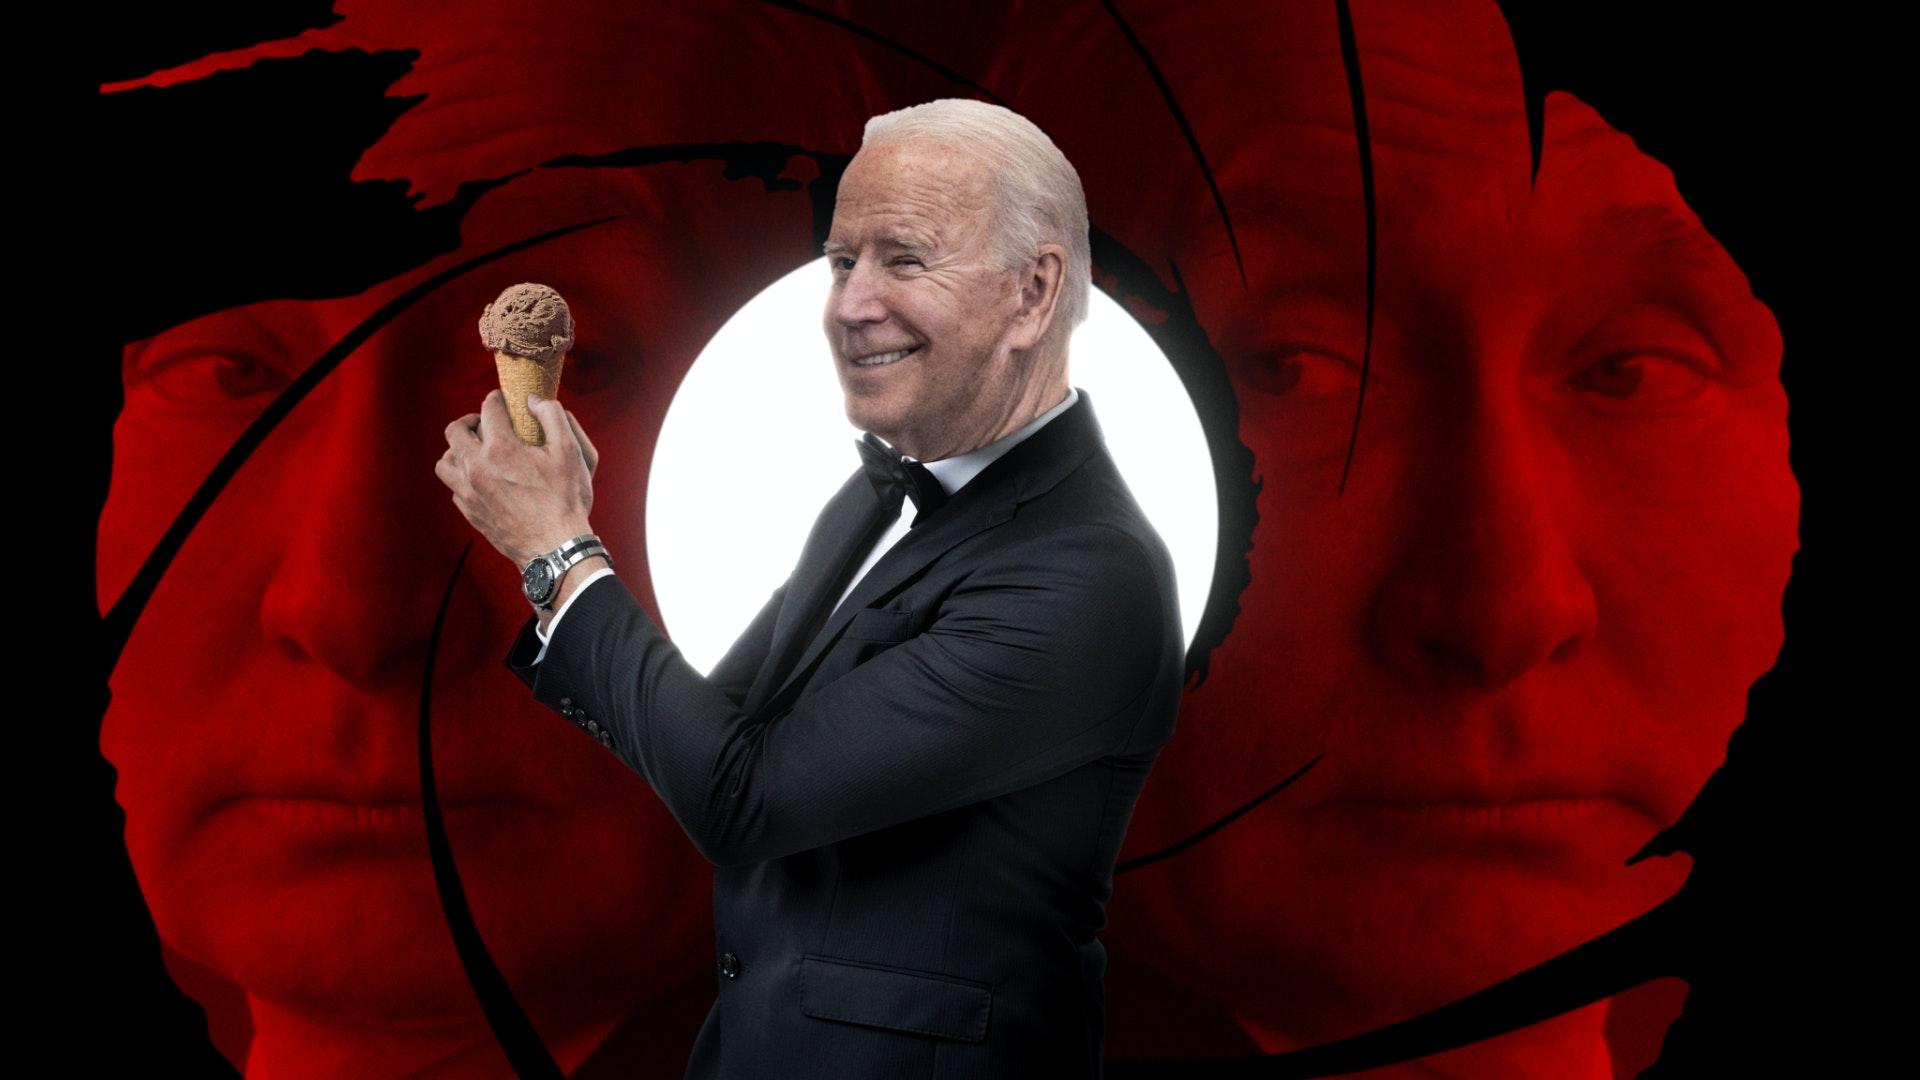 Ep. 1278 - Old Joe Meets The Bond Villain